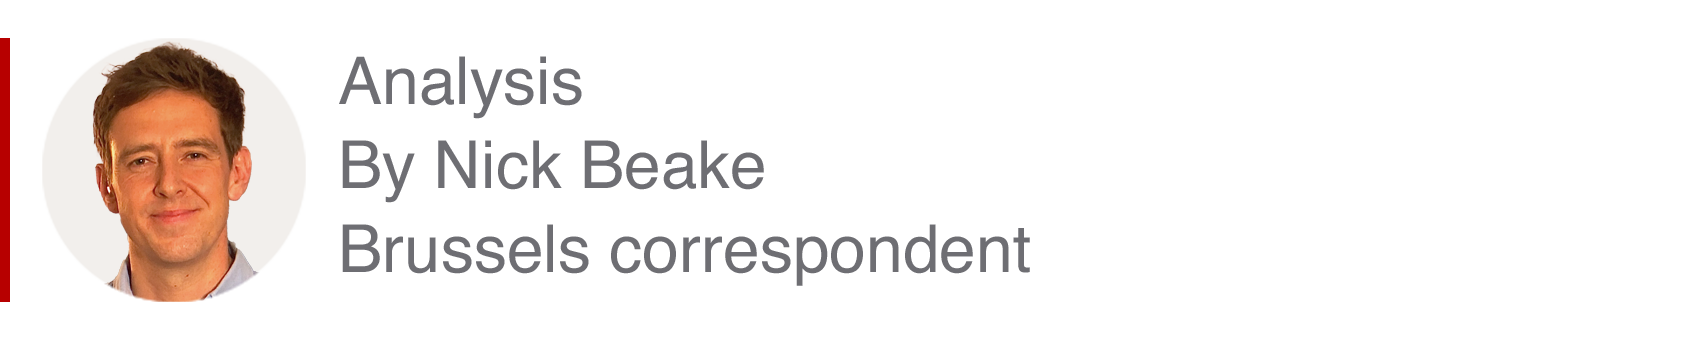 Analysis box by Nick Beake, Brussels correspondent